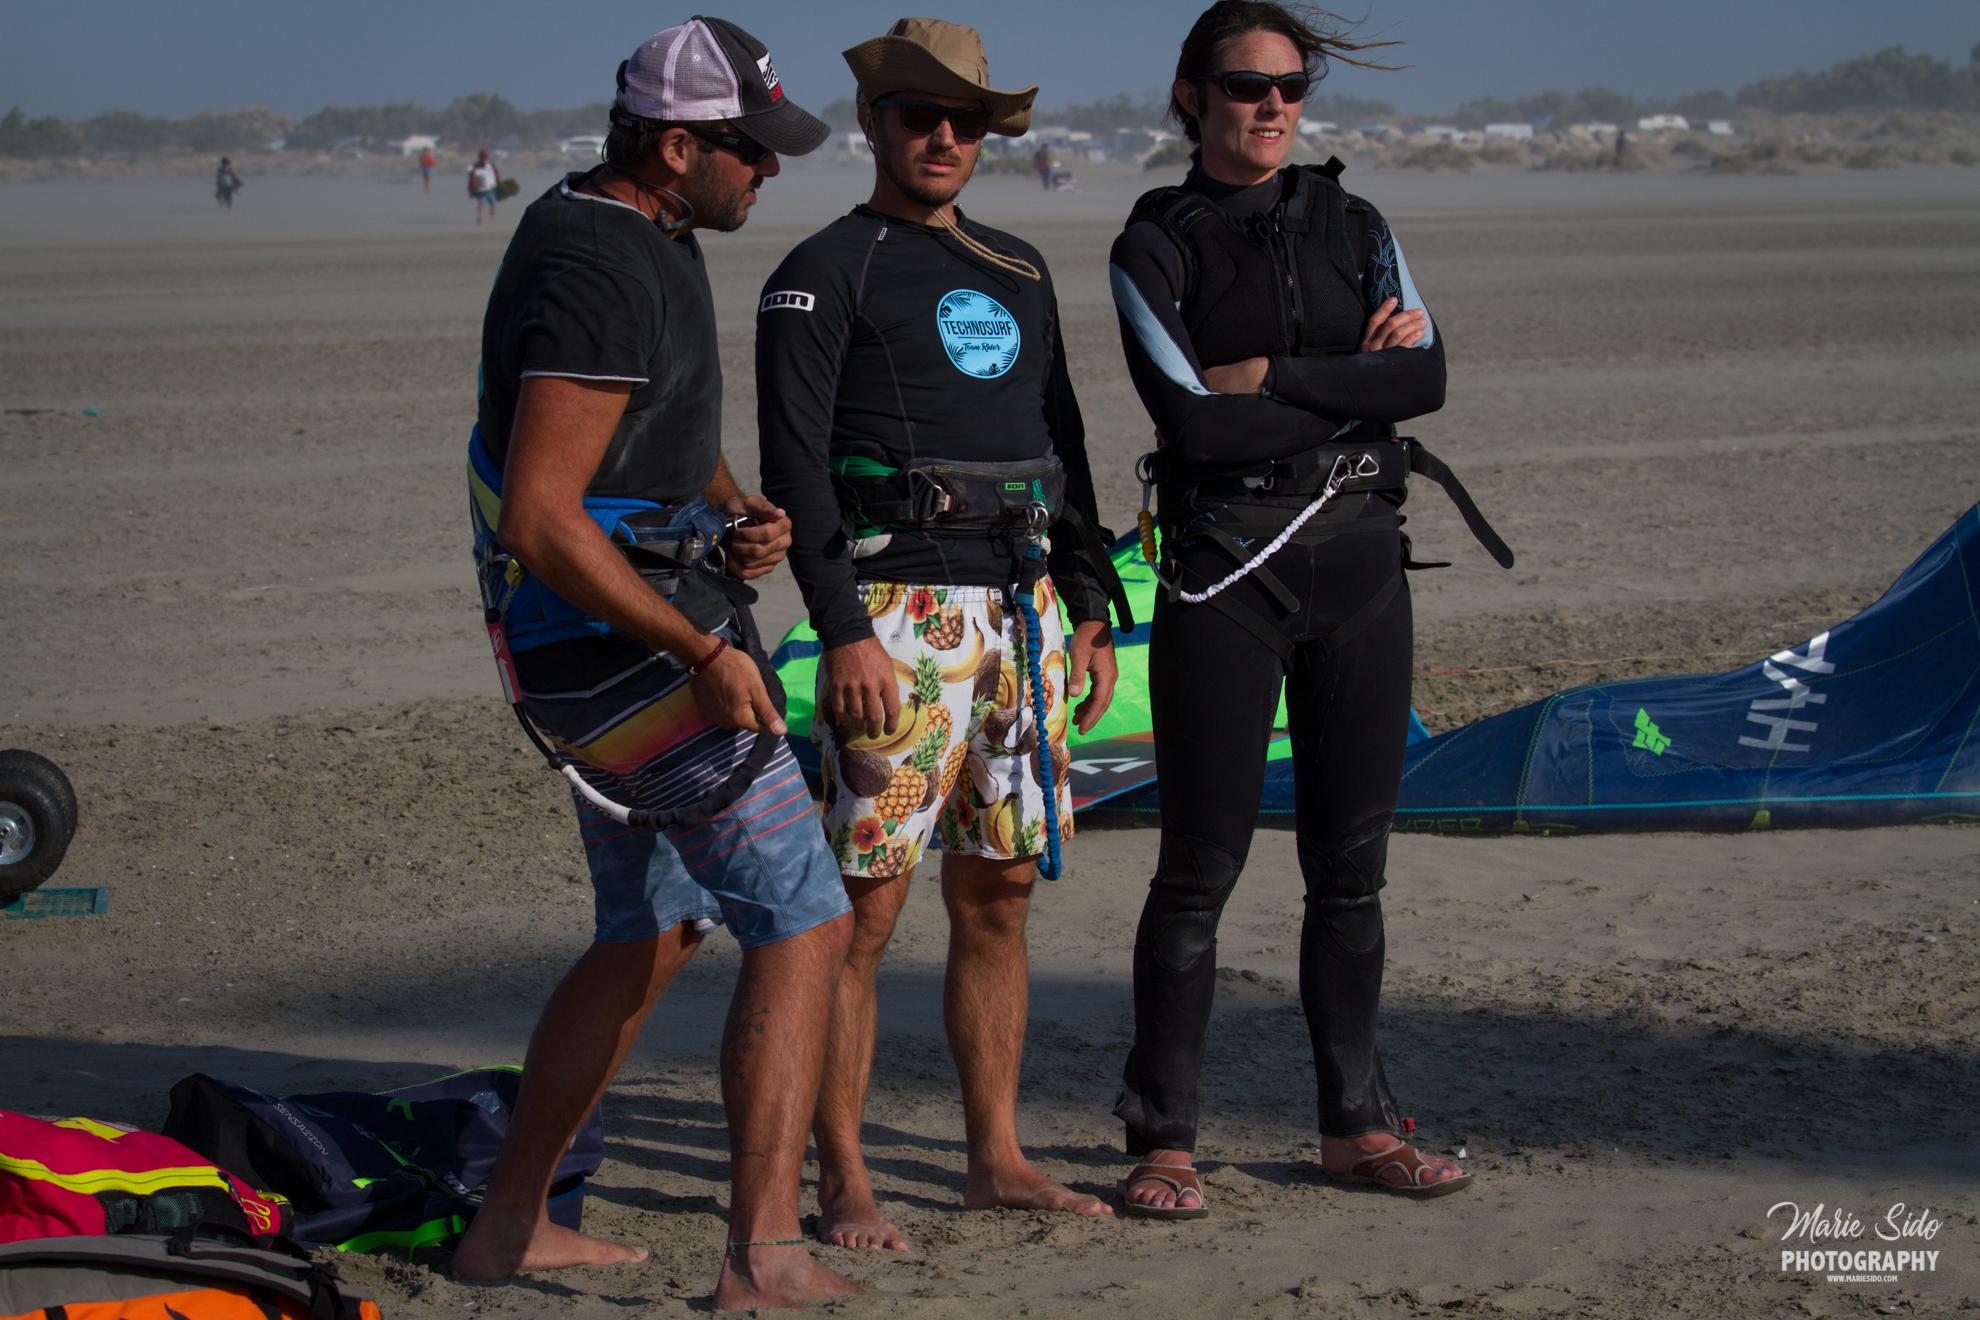 Beauduc Kitesurfing, coaching avec les amis, Mari Sido photography